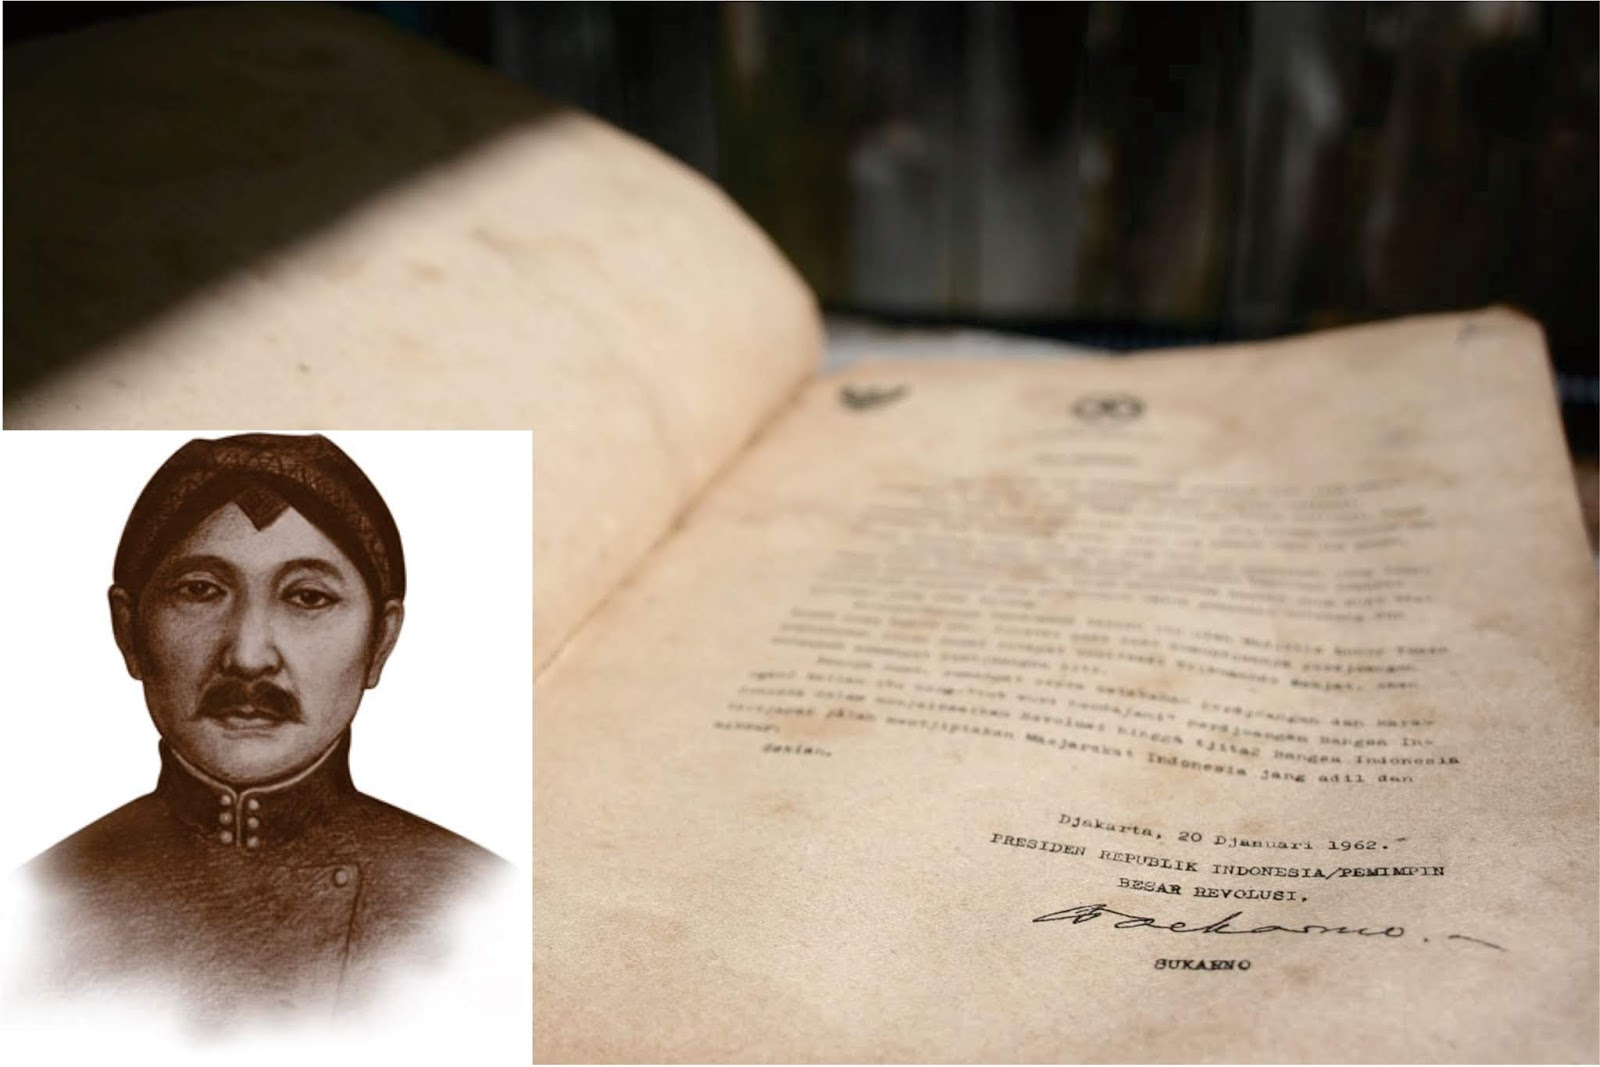 Siapa yang tidak mengenal Ronggowarsito  Pujangga yang terlahir pada Senin  Legi 221ae8bed45a2